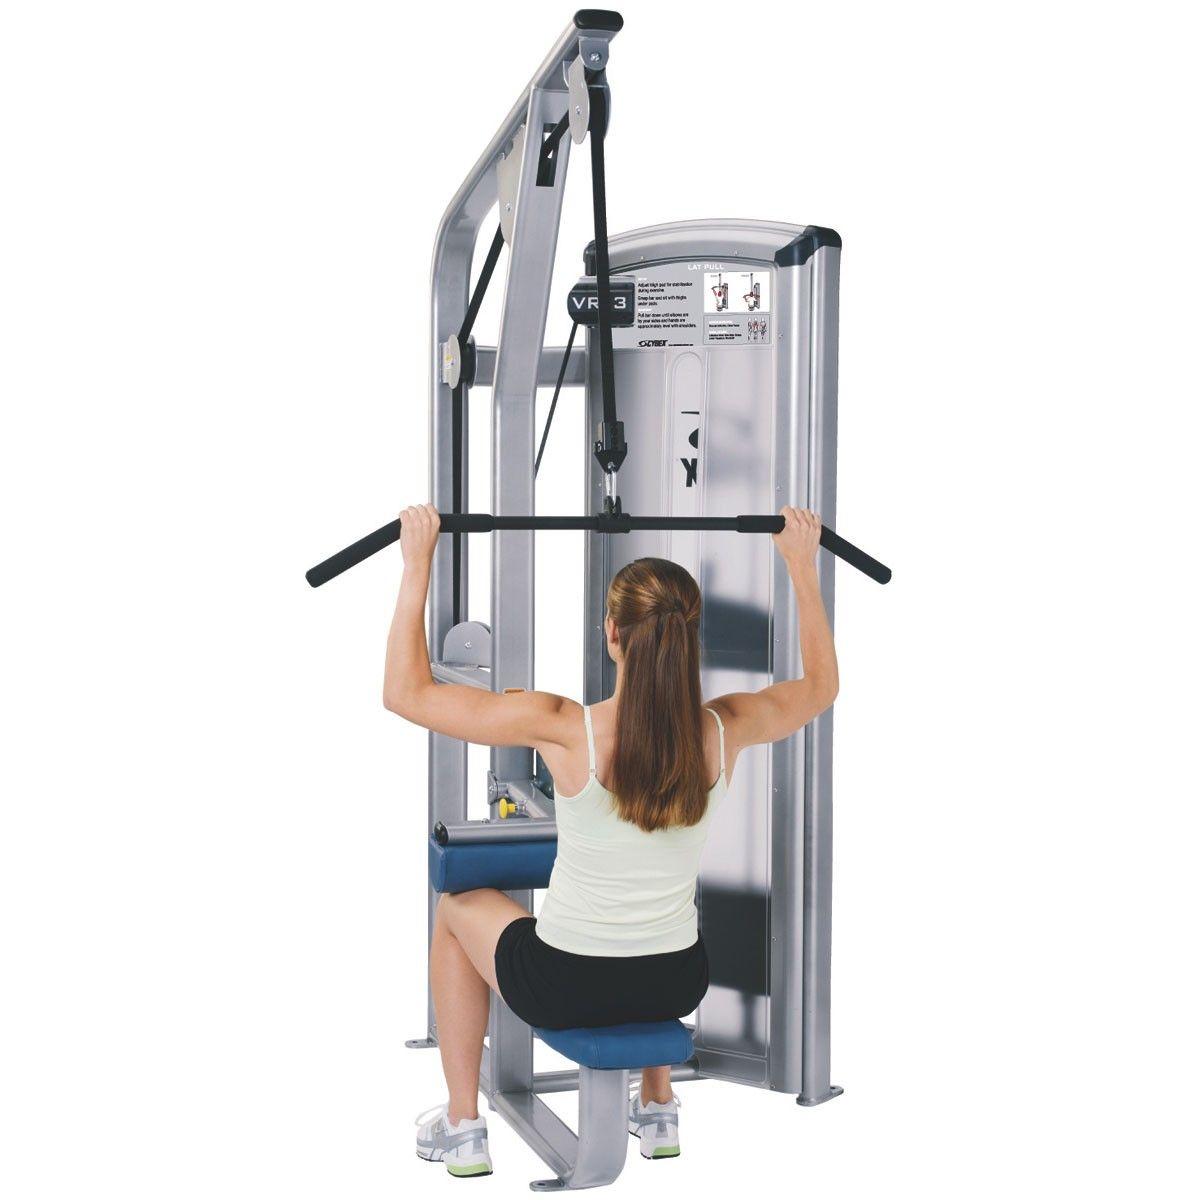 Cybex Treadmill Weight Loss Program: Cybex Club 1 Cybex Vr3 Lat Pulldown